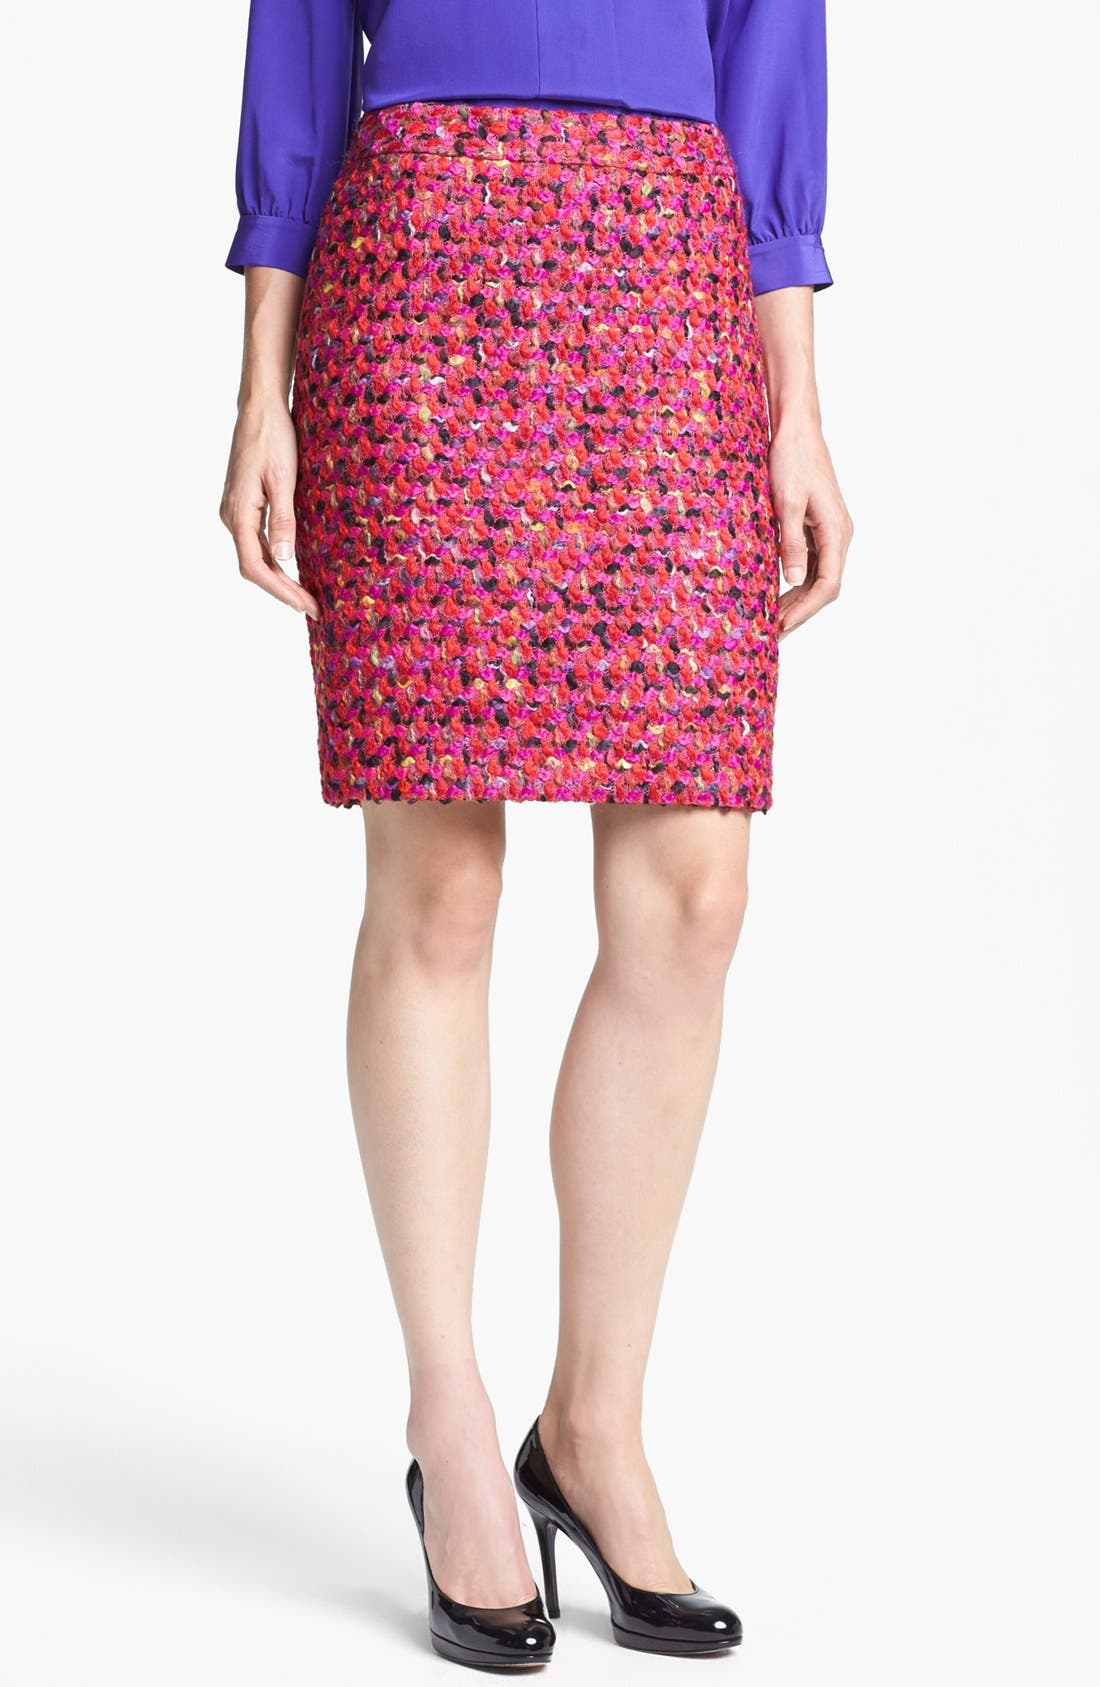 Alternate Image 1 Selected - kate spade new york 'judy' wool blend skirt